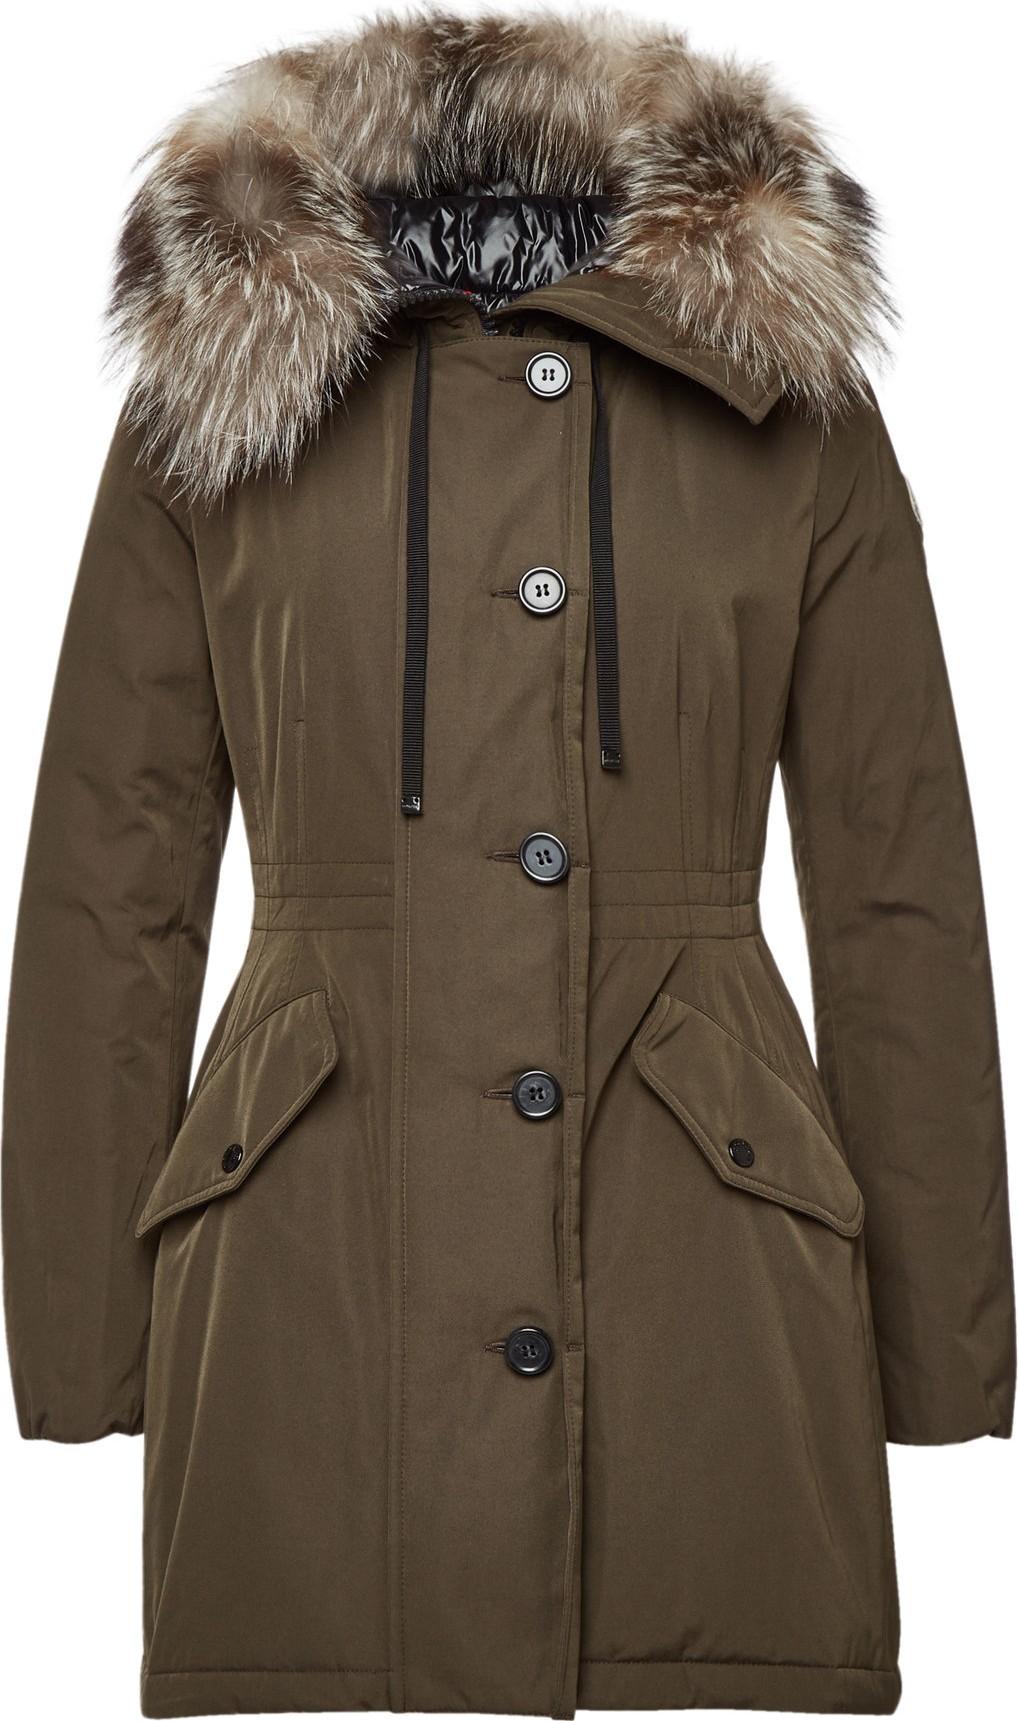 2de9db265 Moncler Monticole Down Parka with Fur-Trimmed Hood - Mkt